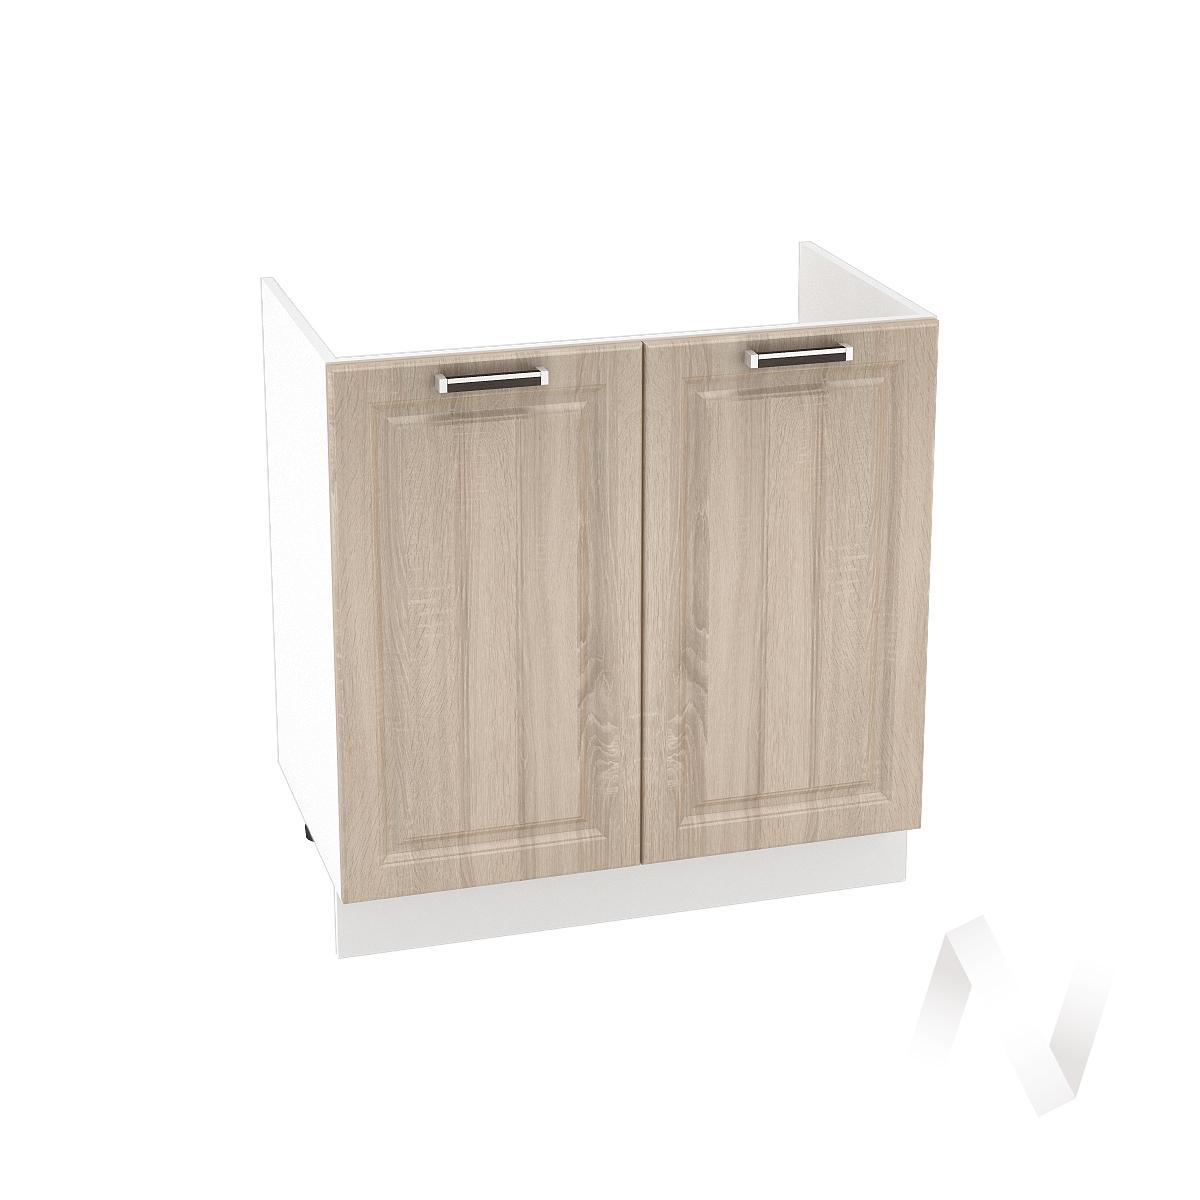 "Кухня ""Прага"": Шкаф нижний под мойку 800, ШНМ 800 (дуб сонома/корпус белый)"